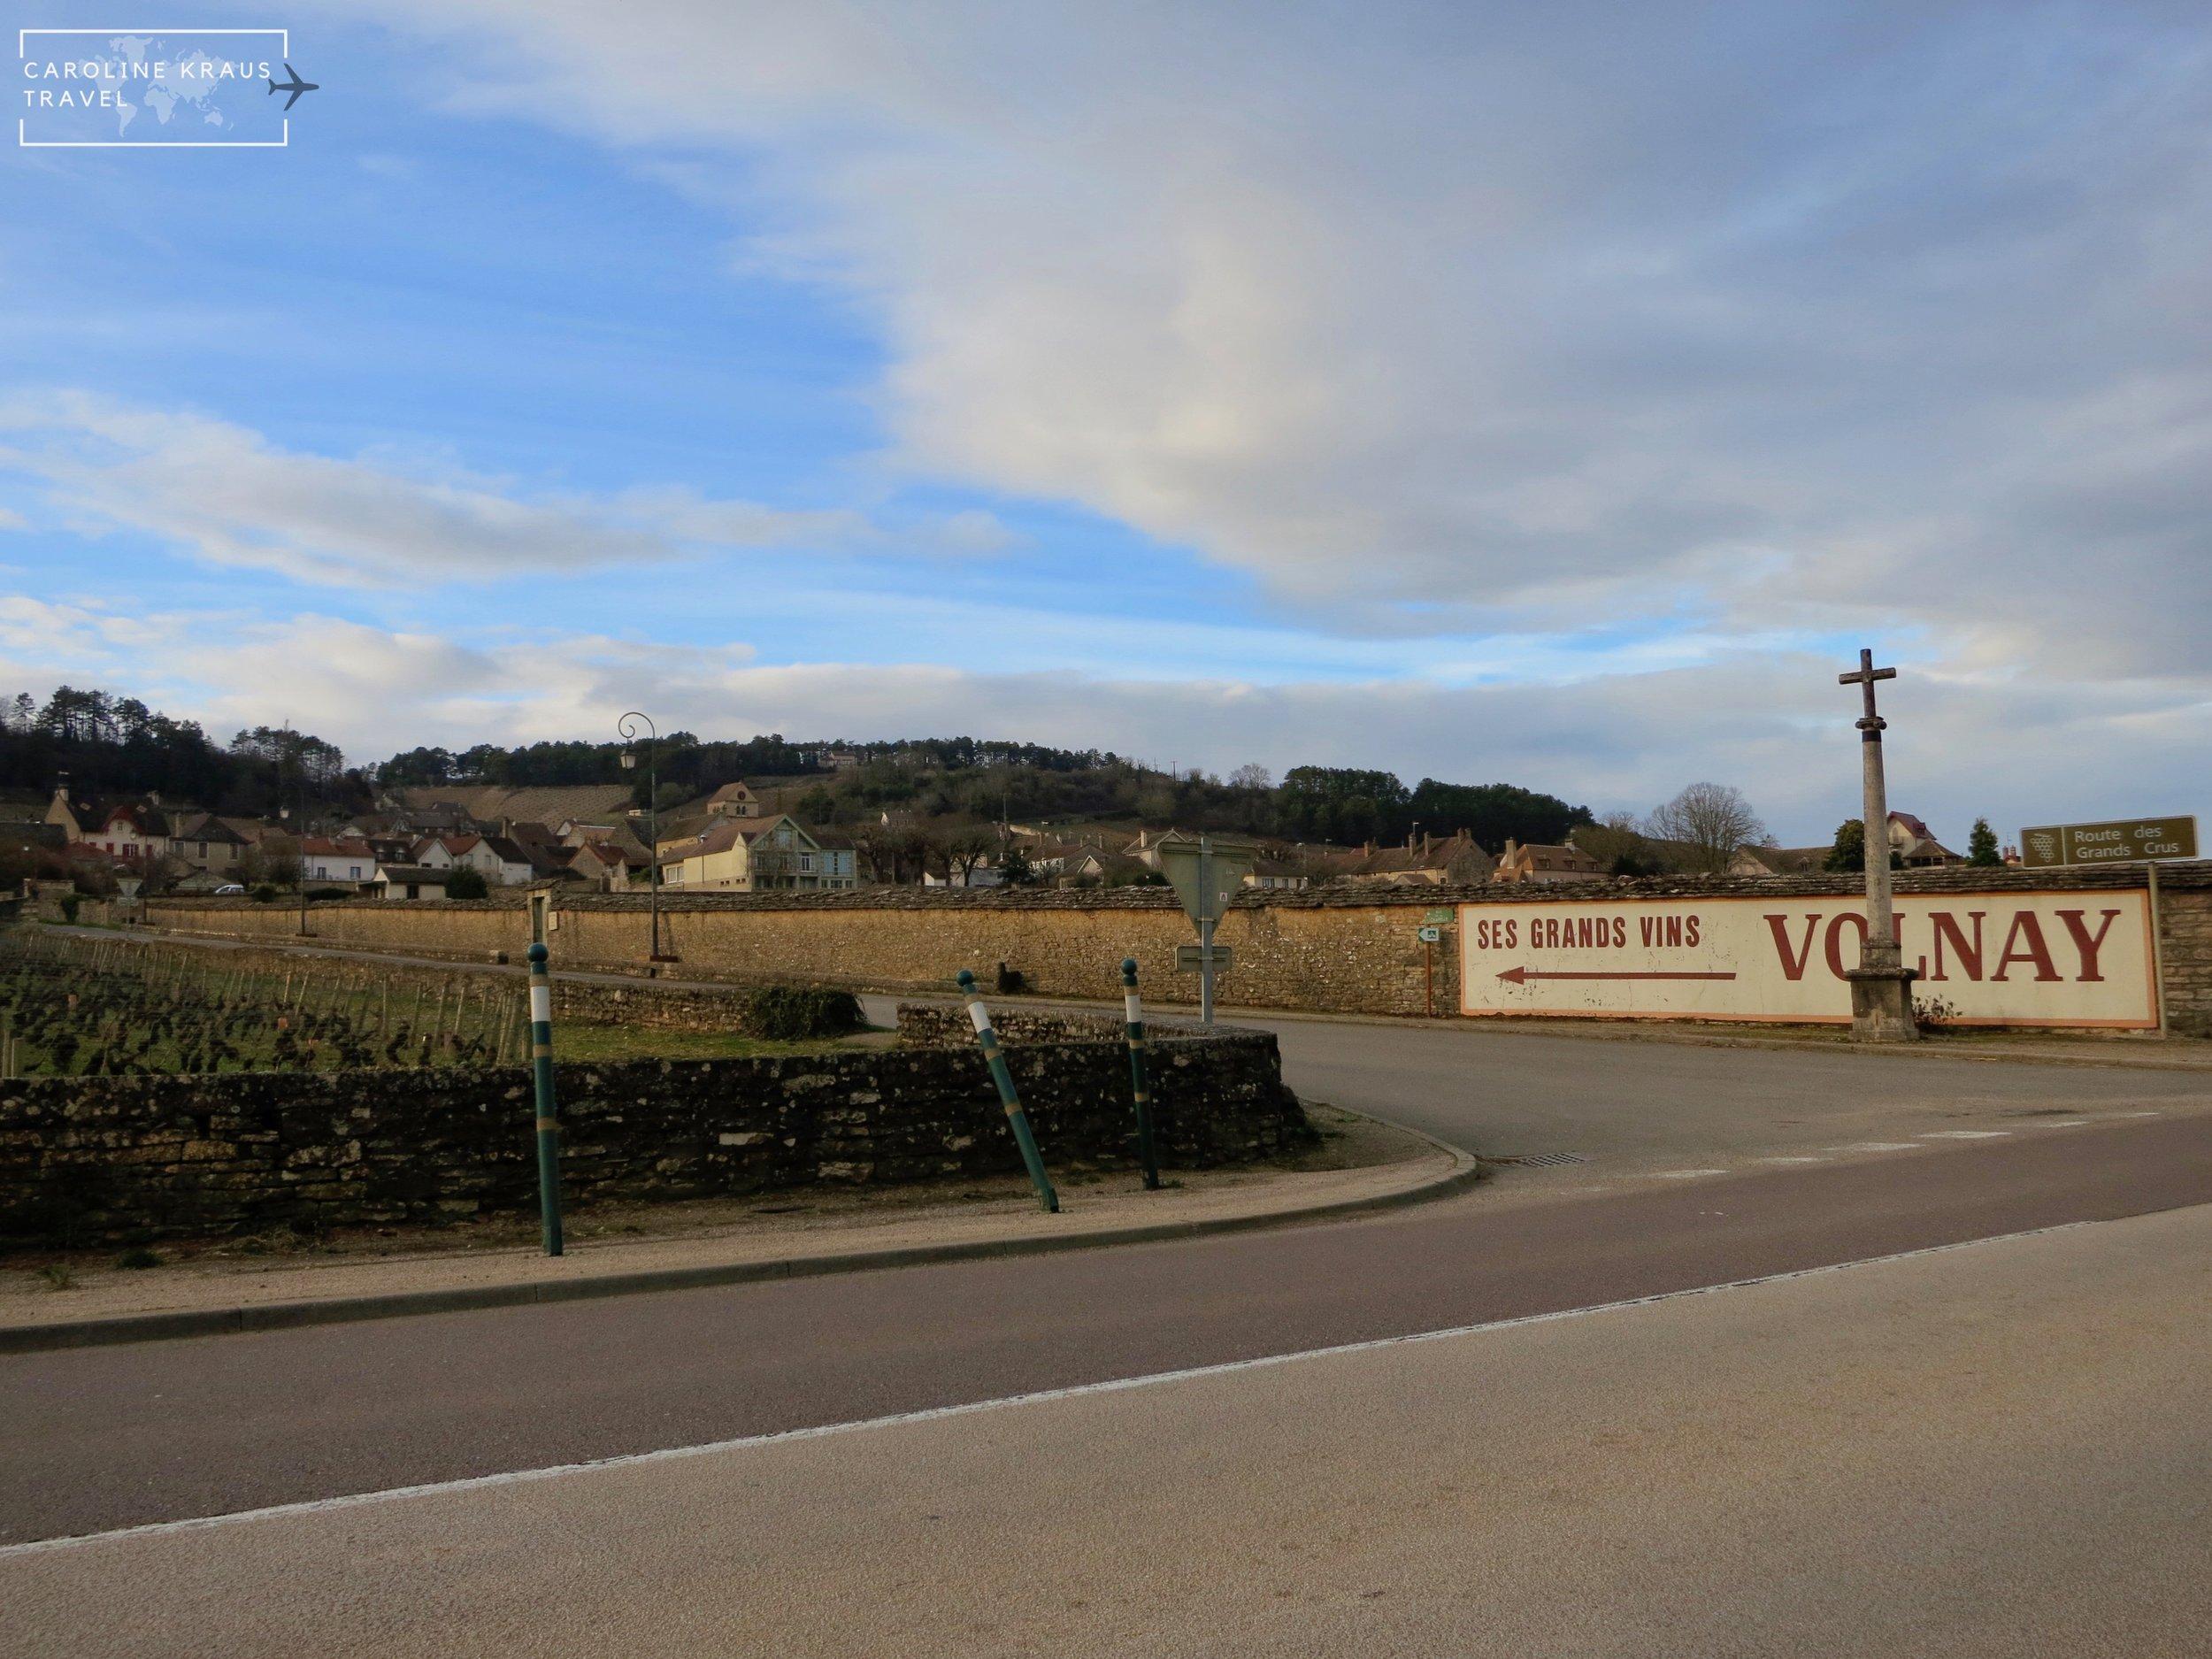 Biking into the village of VOlnay